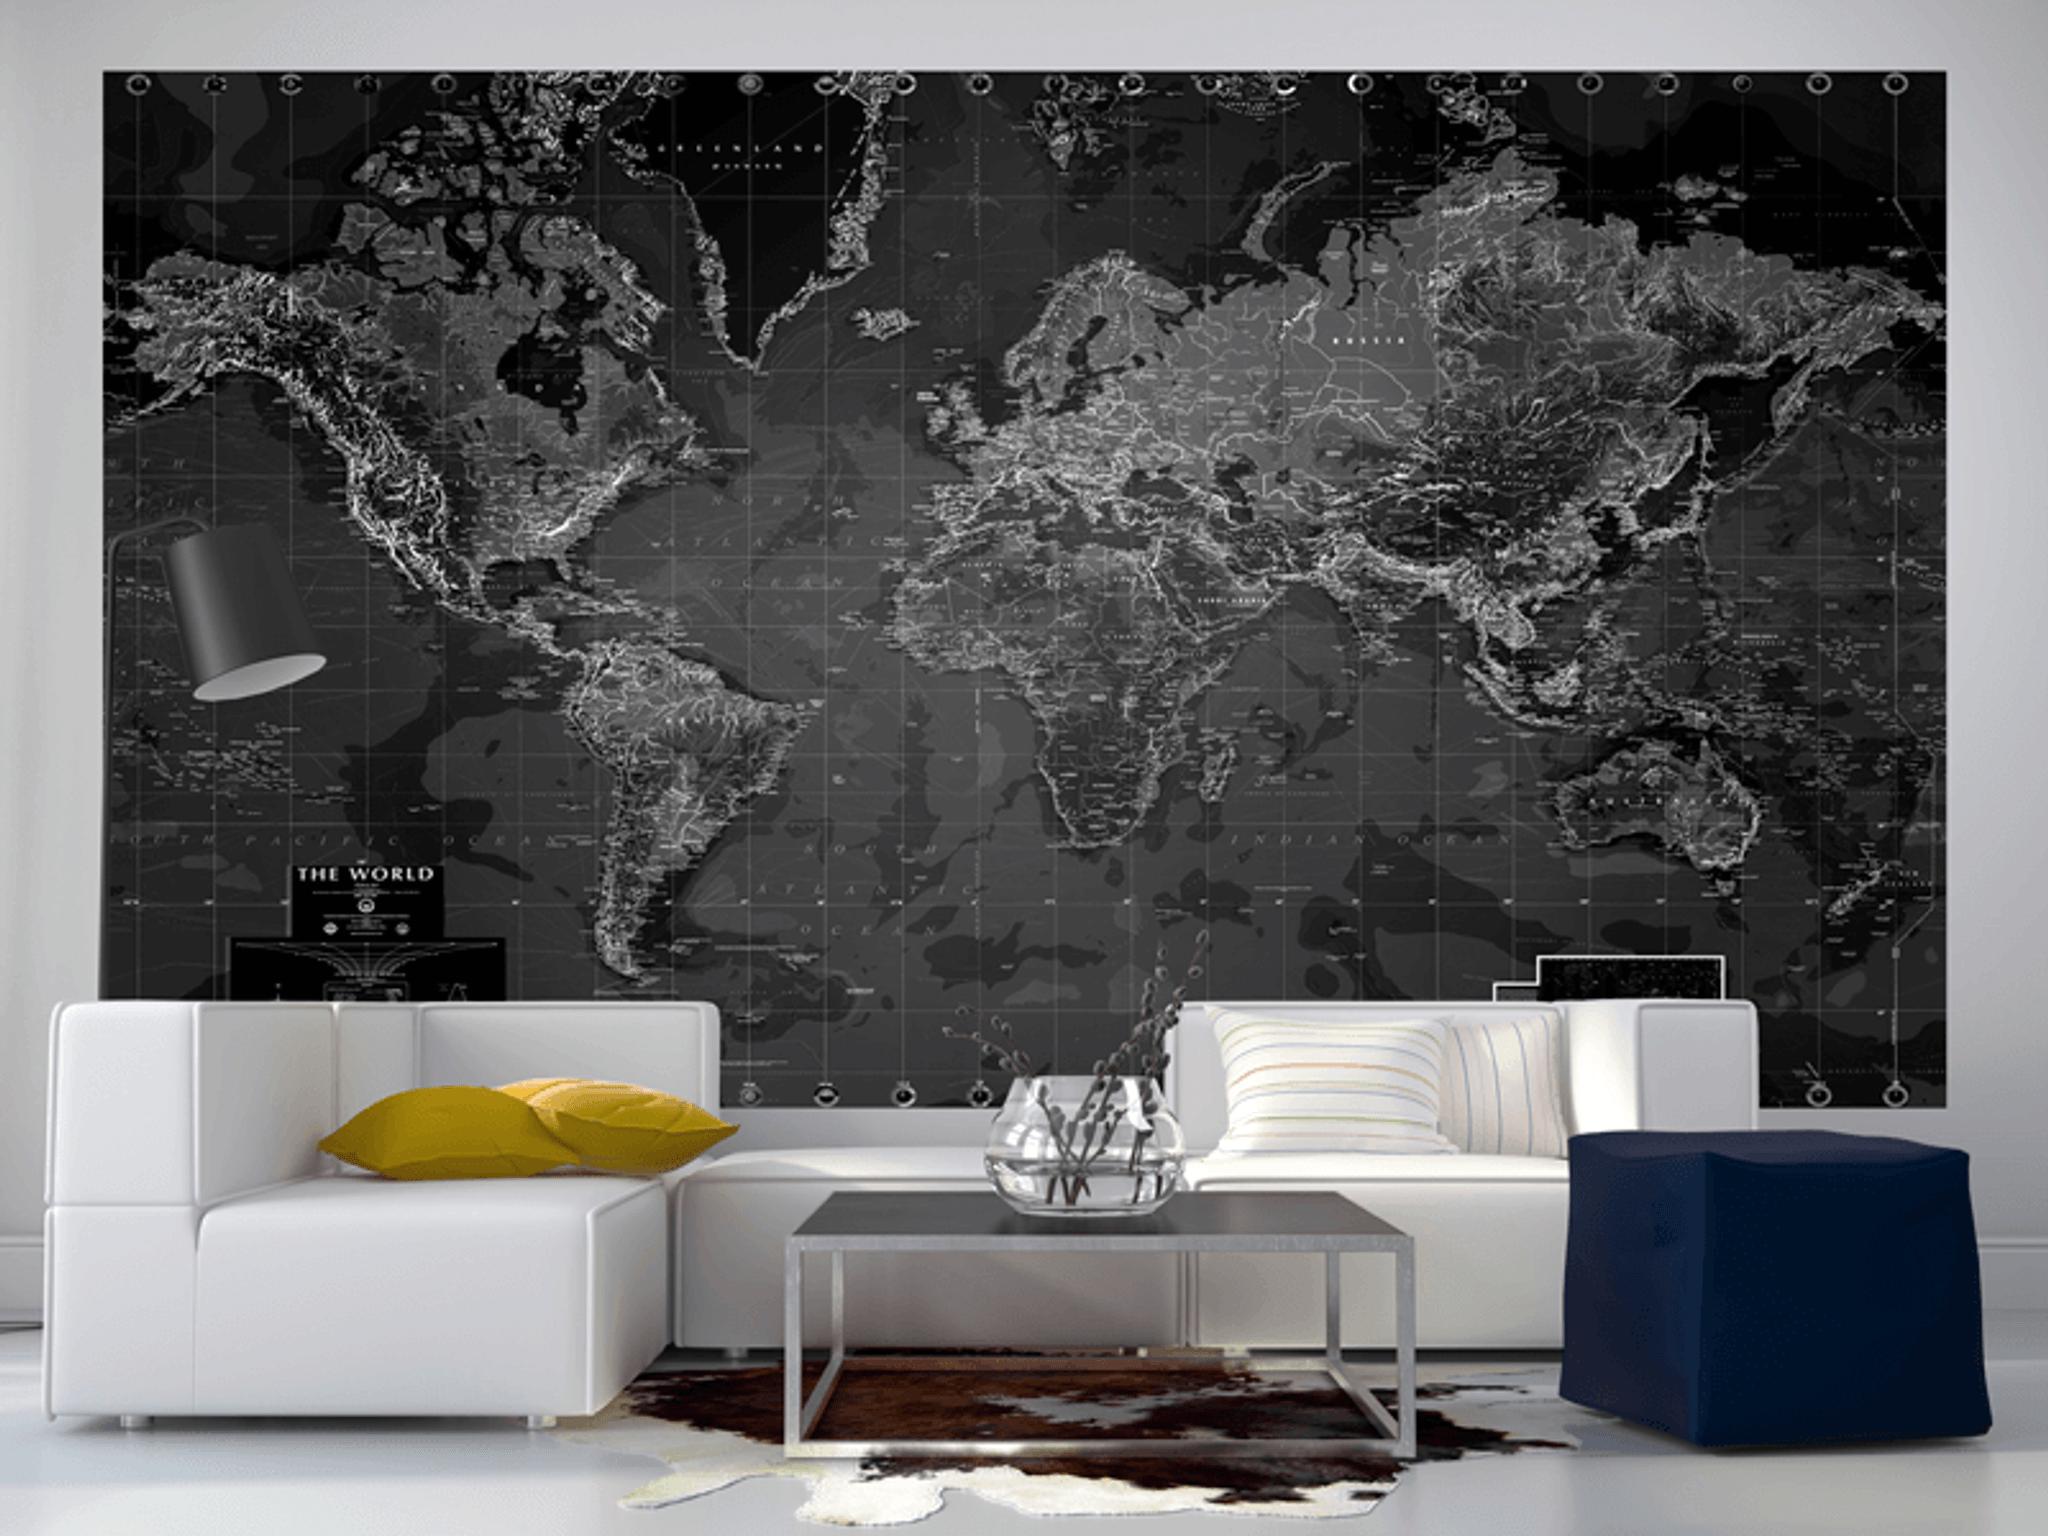 World Map Wall Mural black and white world map wall mural - rand mcnally store